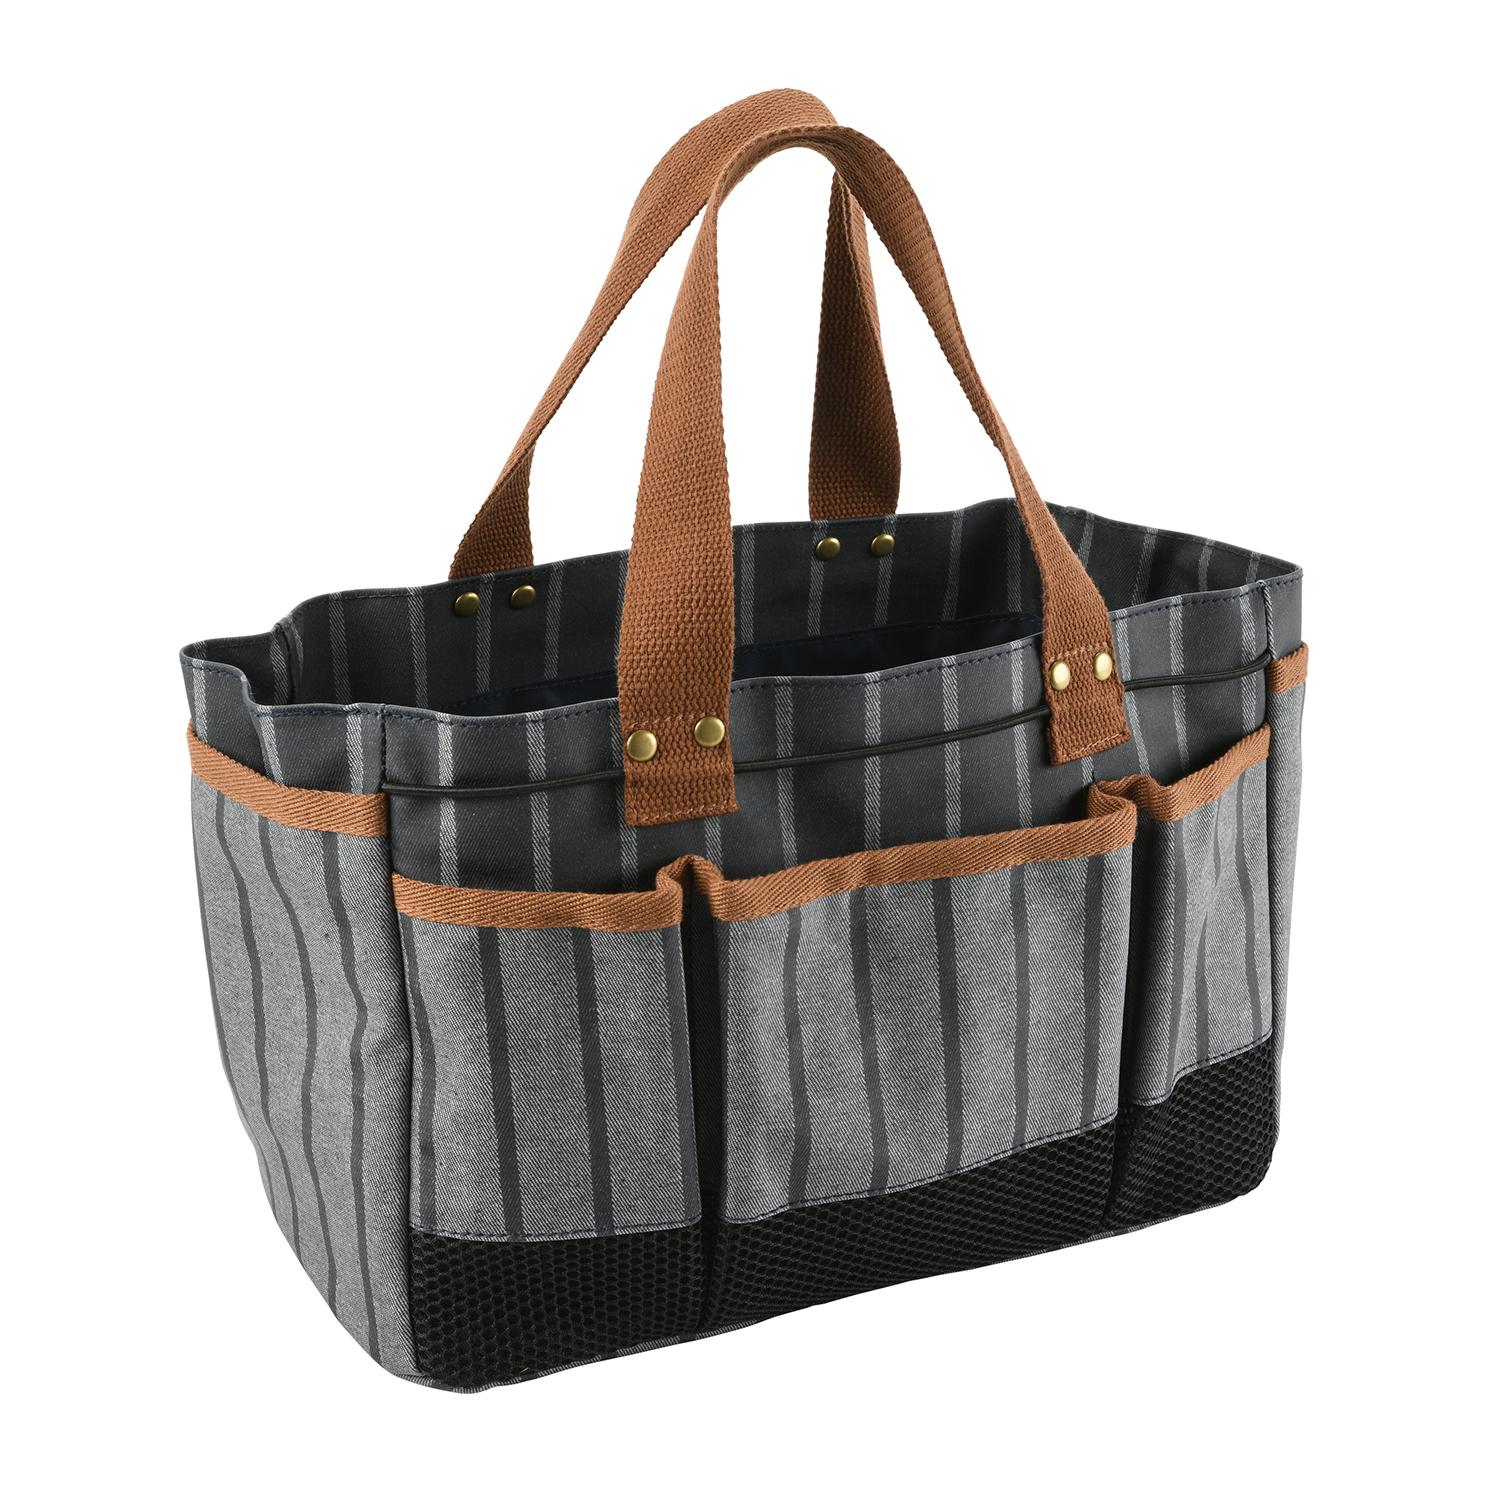 Burgon & Ball – Sophie Conran Gardeners Tool Bag